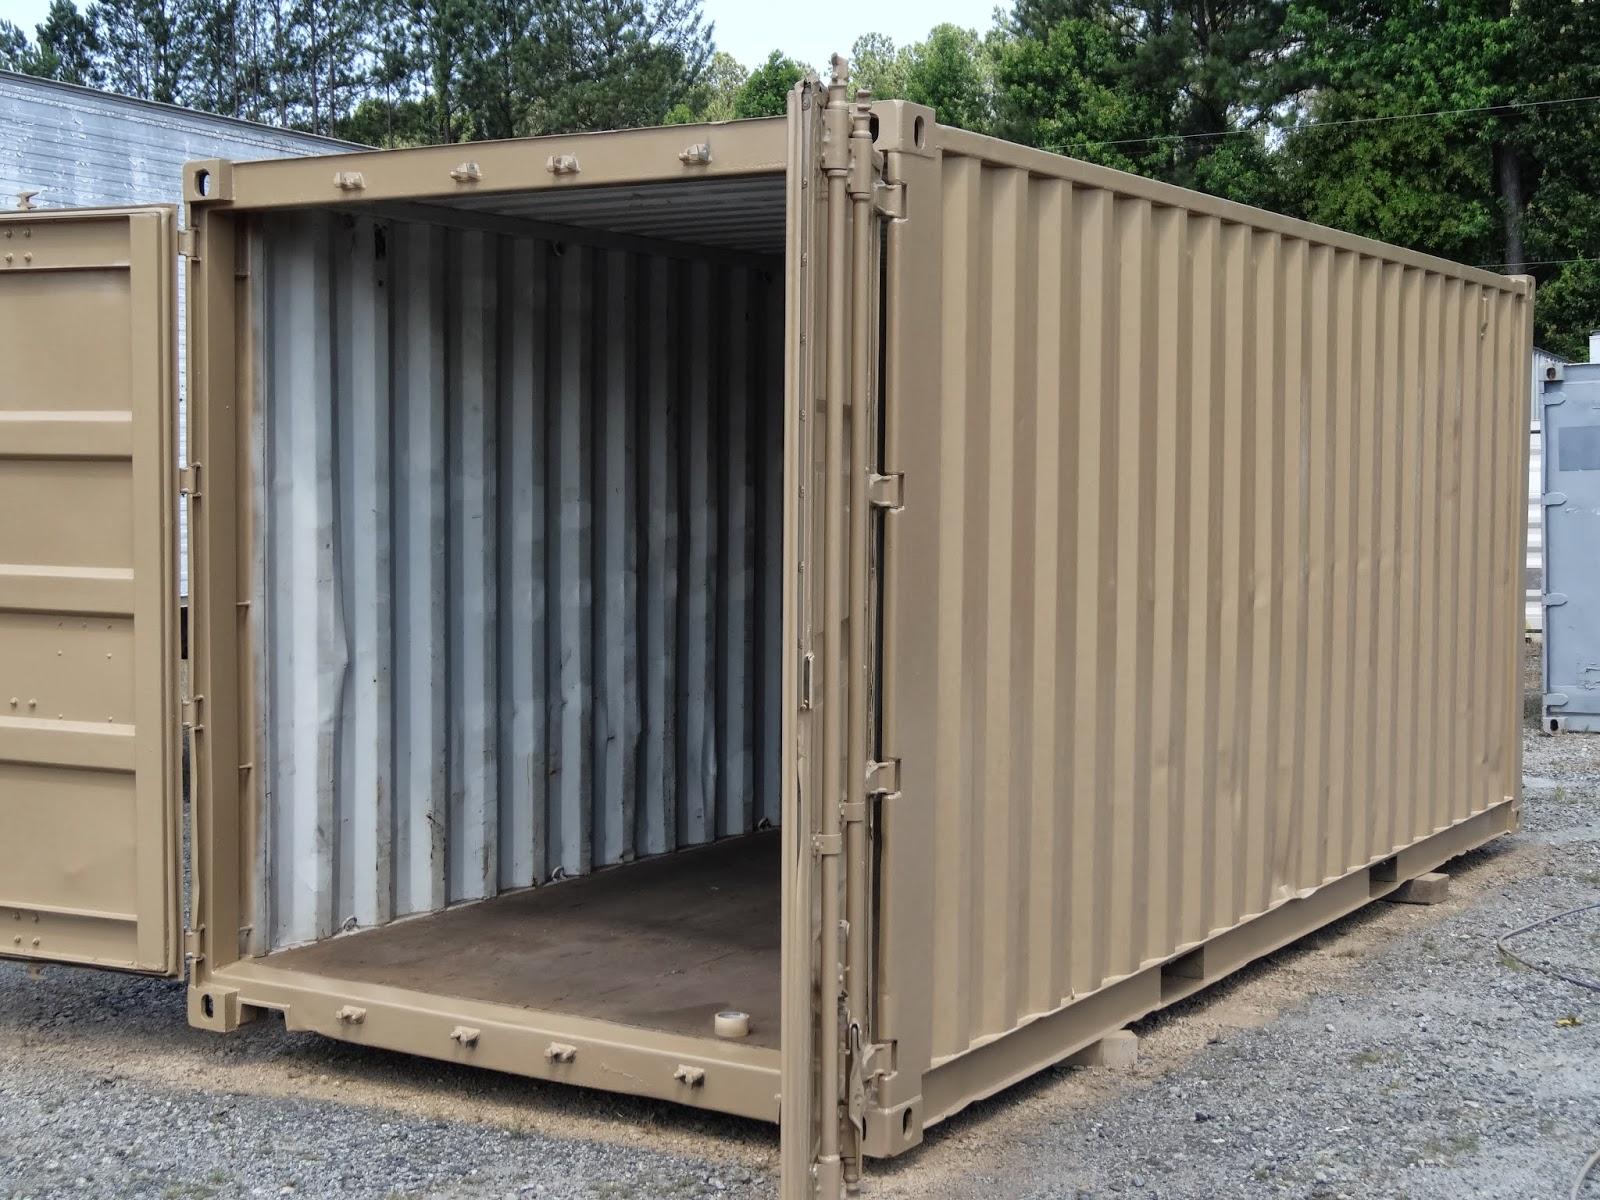 Best Kitchen Gallery: Buy Used Shipping Containers For Storage of Used Shipping Containers Sizes on rachelxblog.com